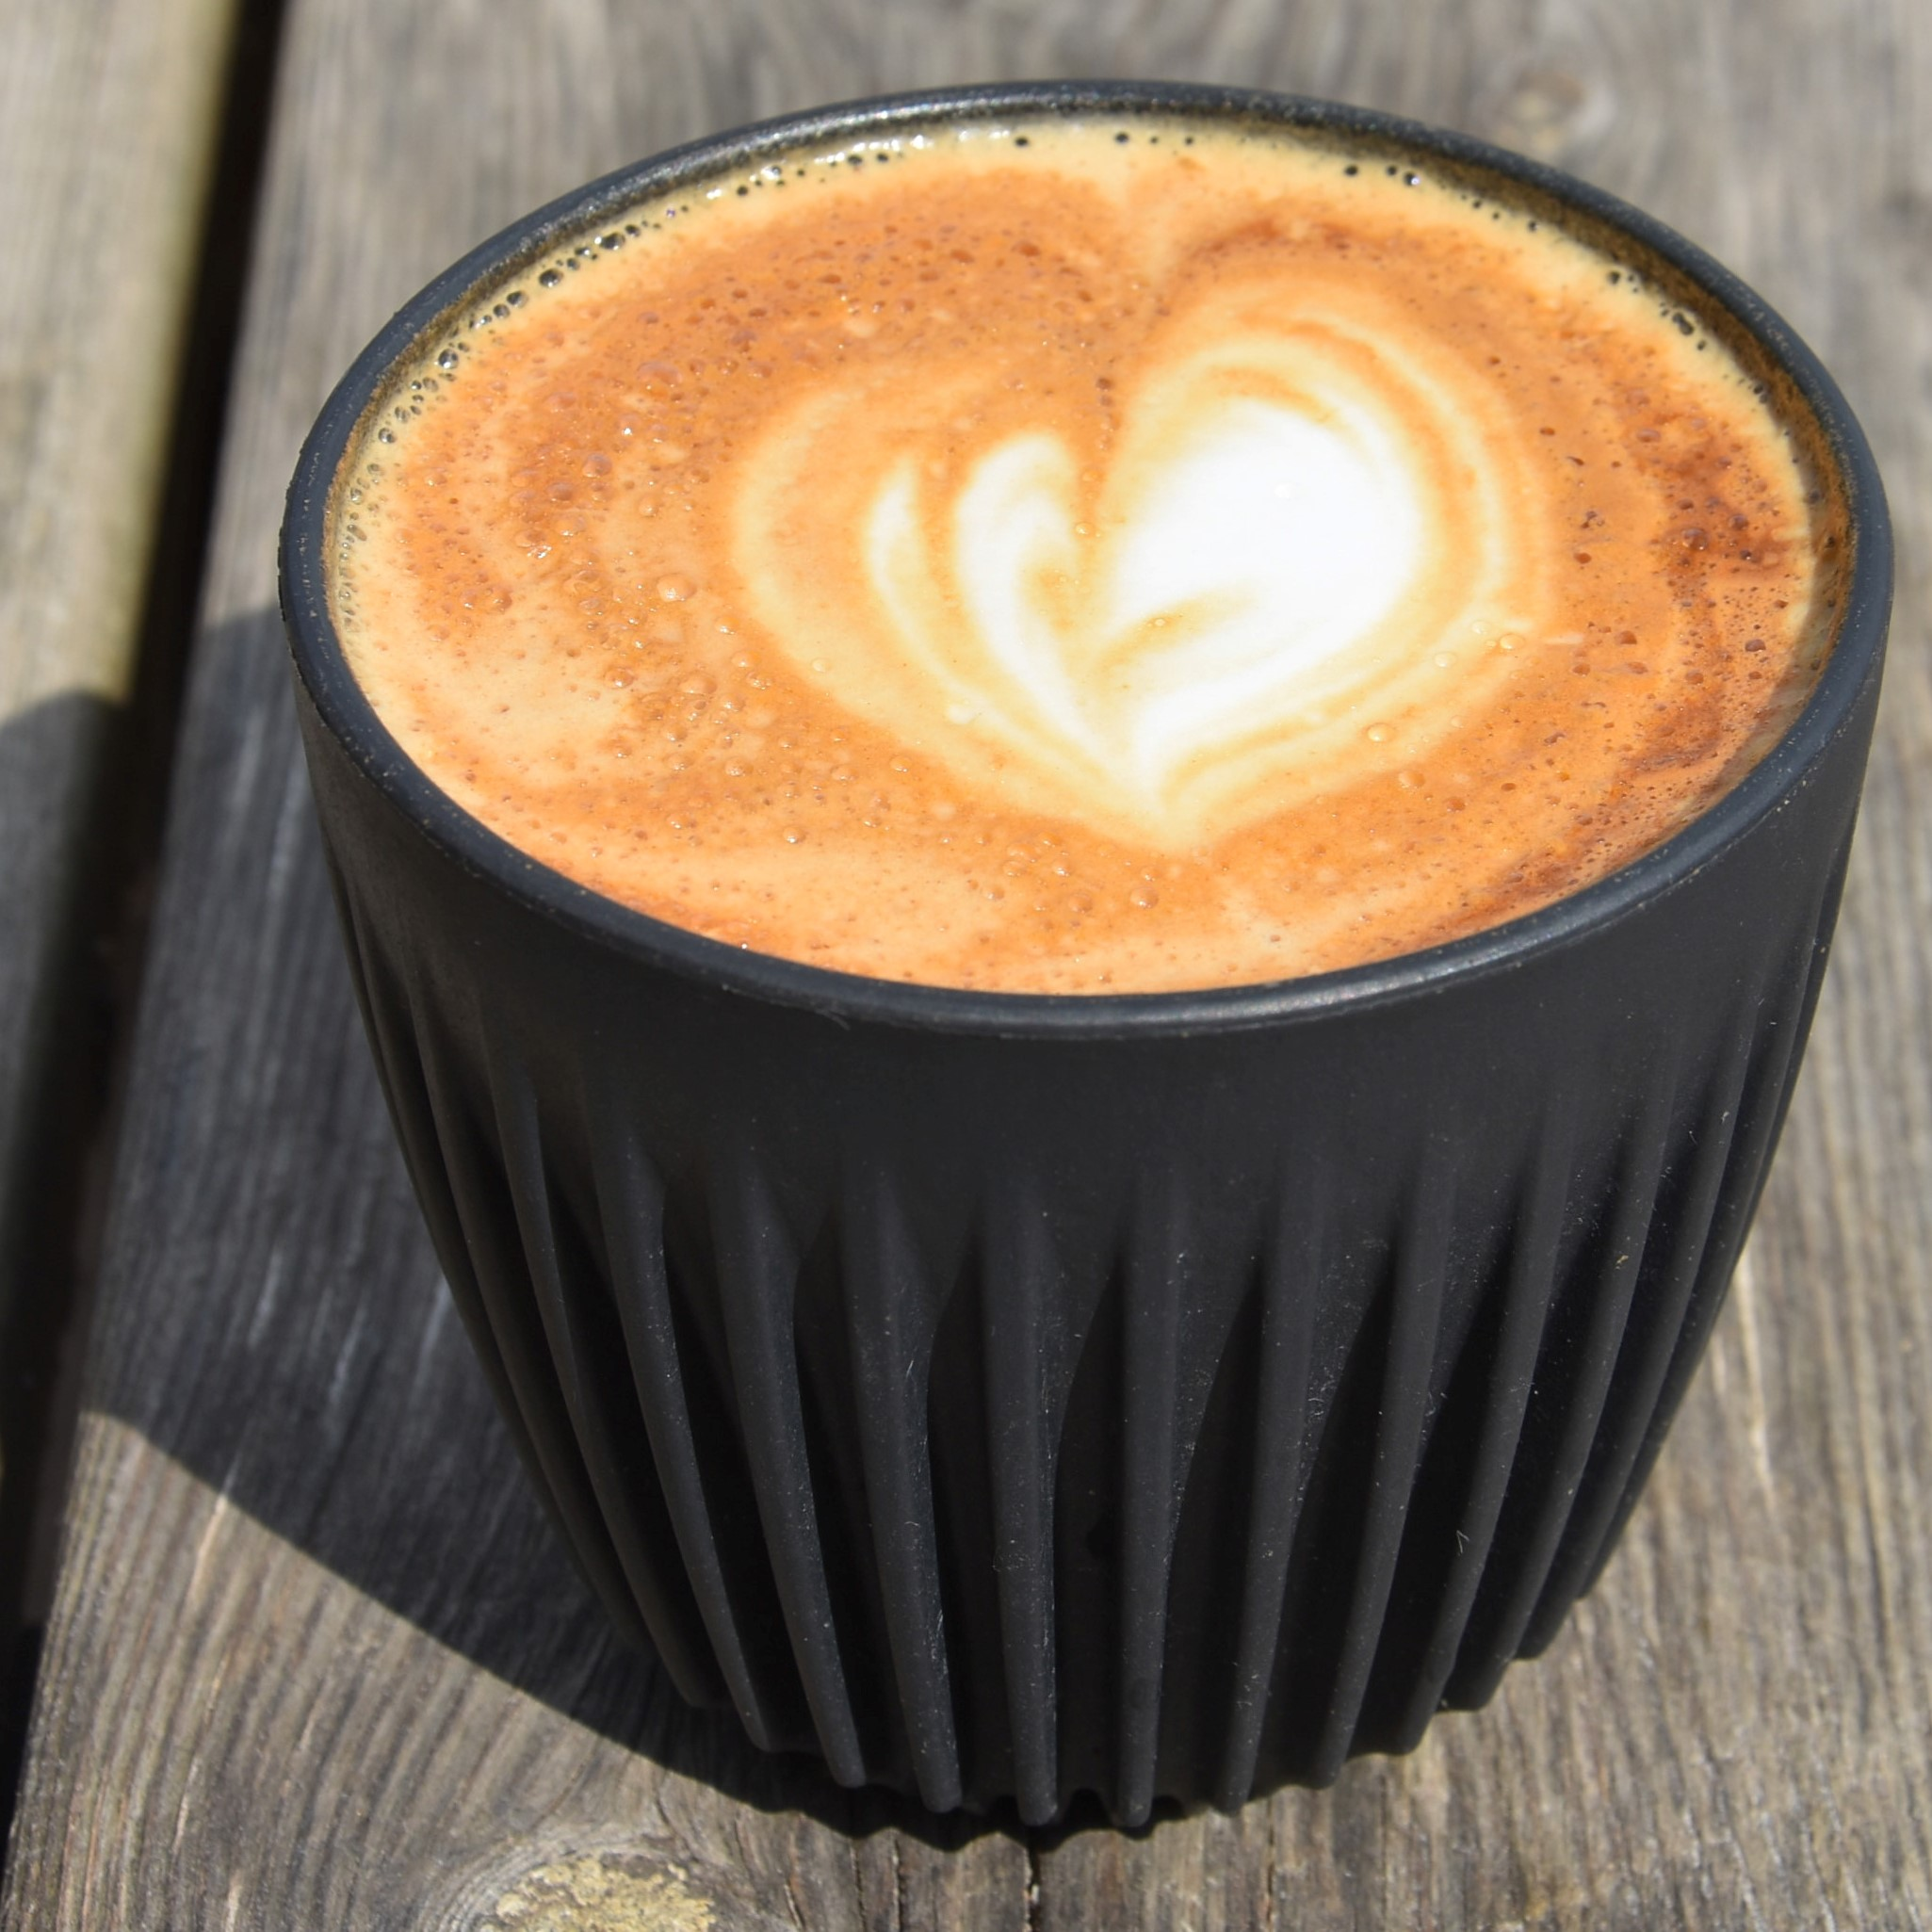 Coffee in the sun: my flat white, in my HuskeeCup, sitting in the sun in the farmyard at Espresso Farm.